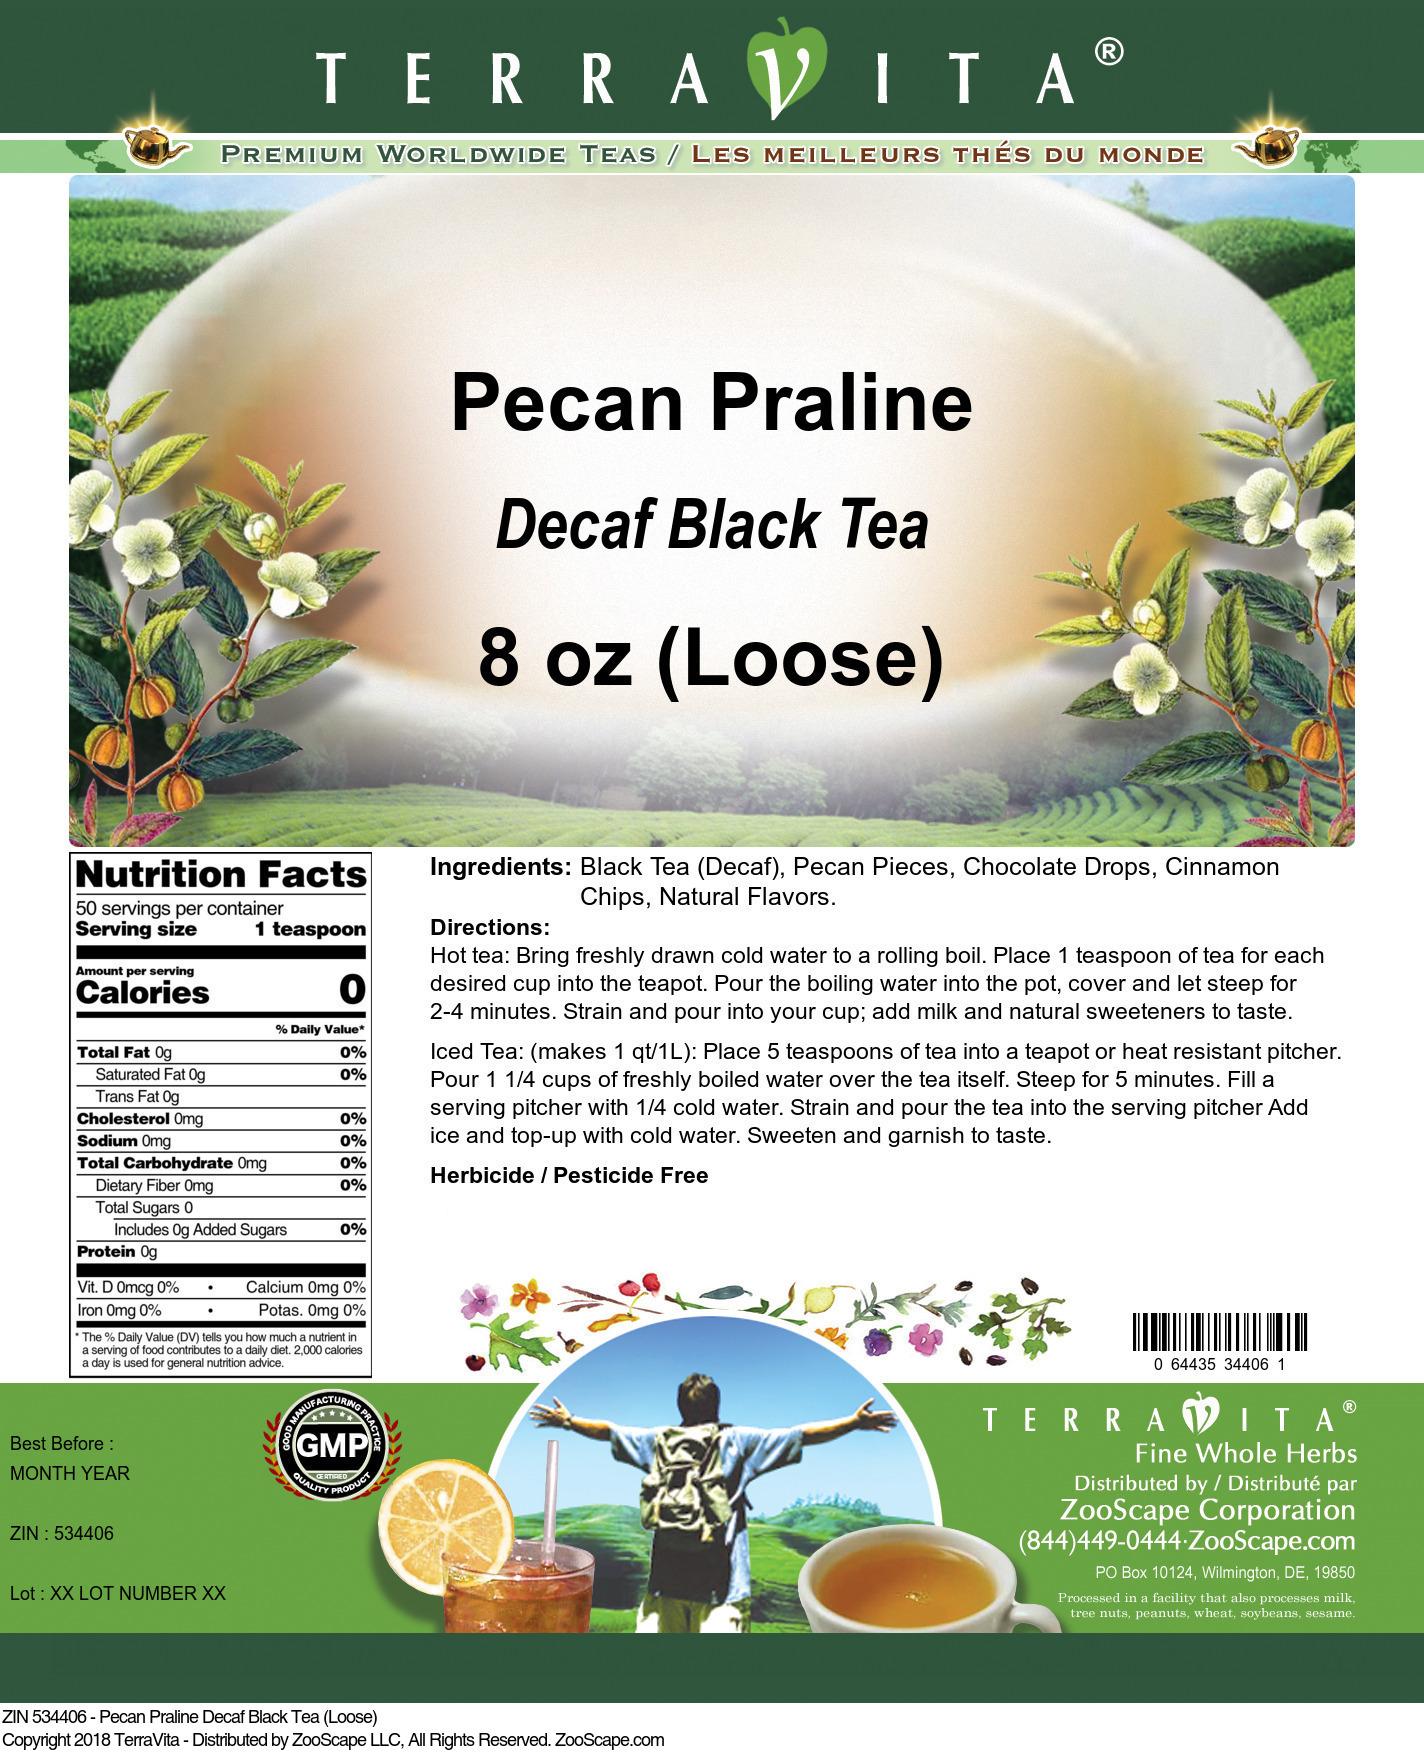 Pecan Praline Decaf Black Tea (Loose)